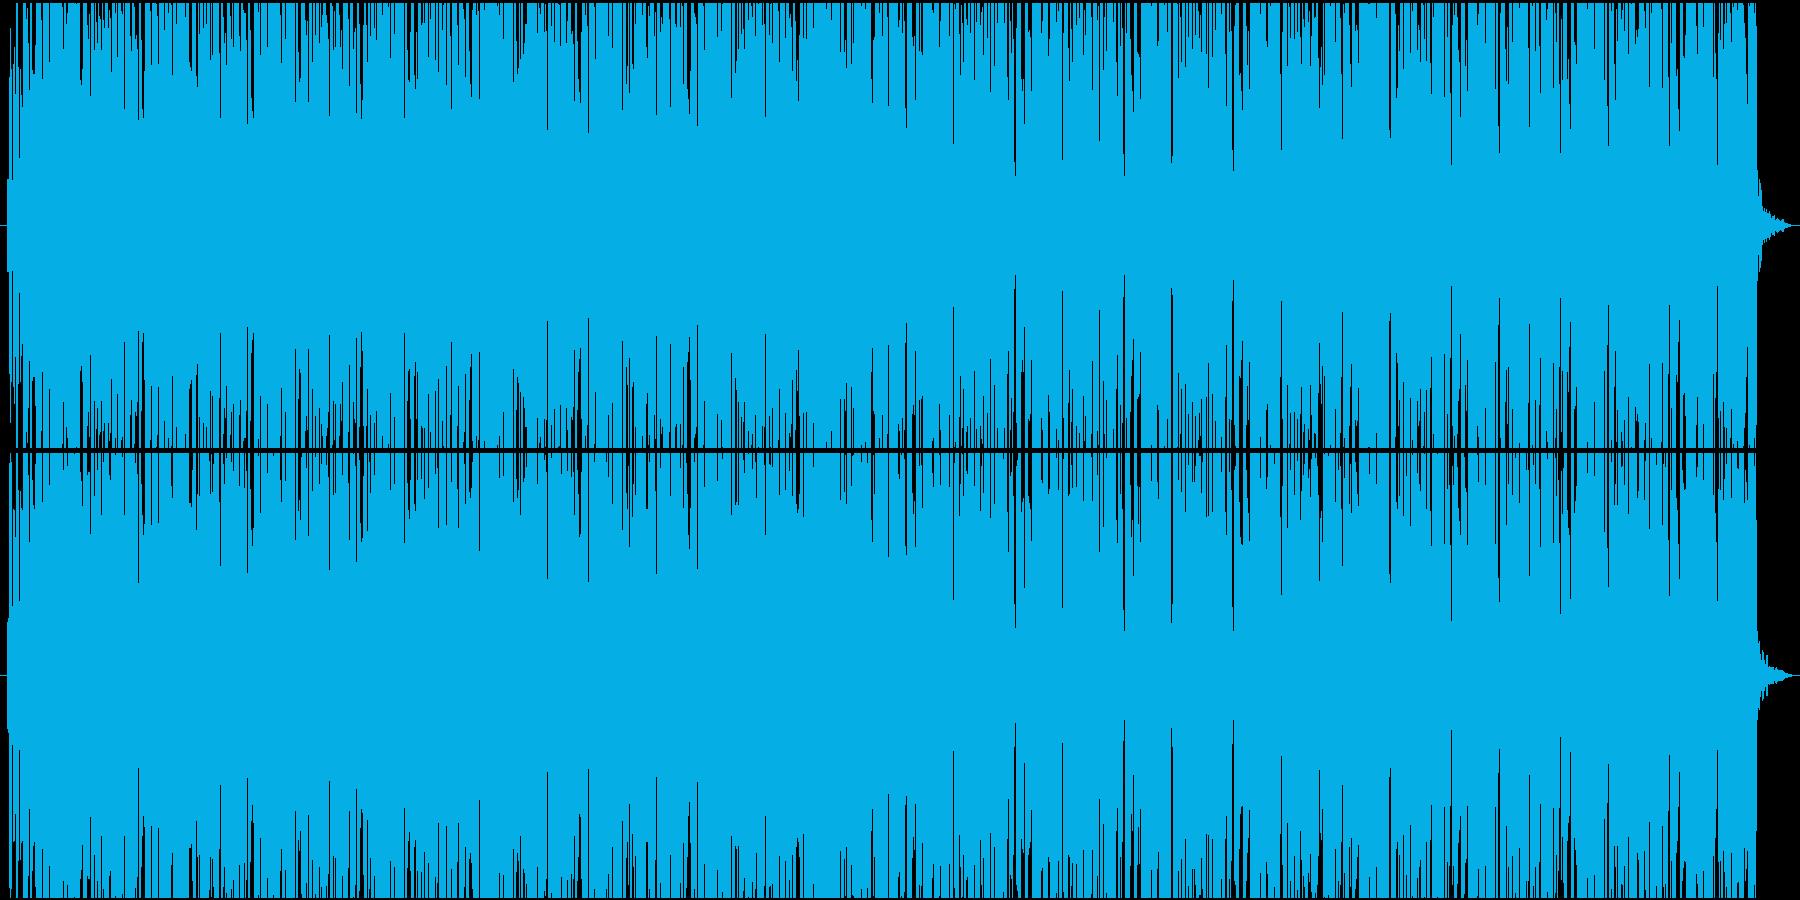 TikTokにありそうなパリピ系EDMの再生済みの波形